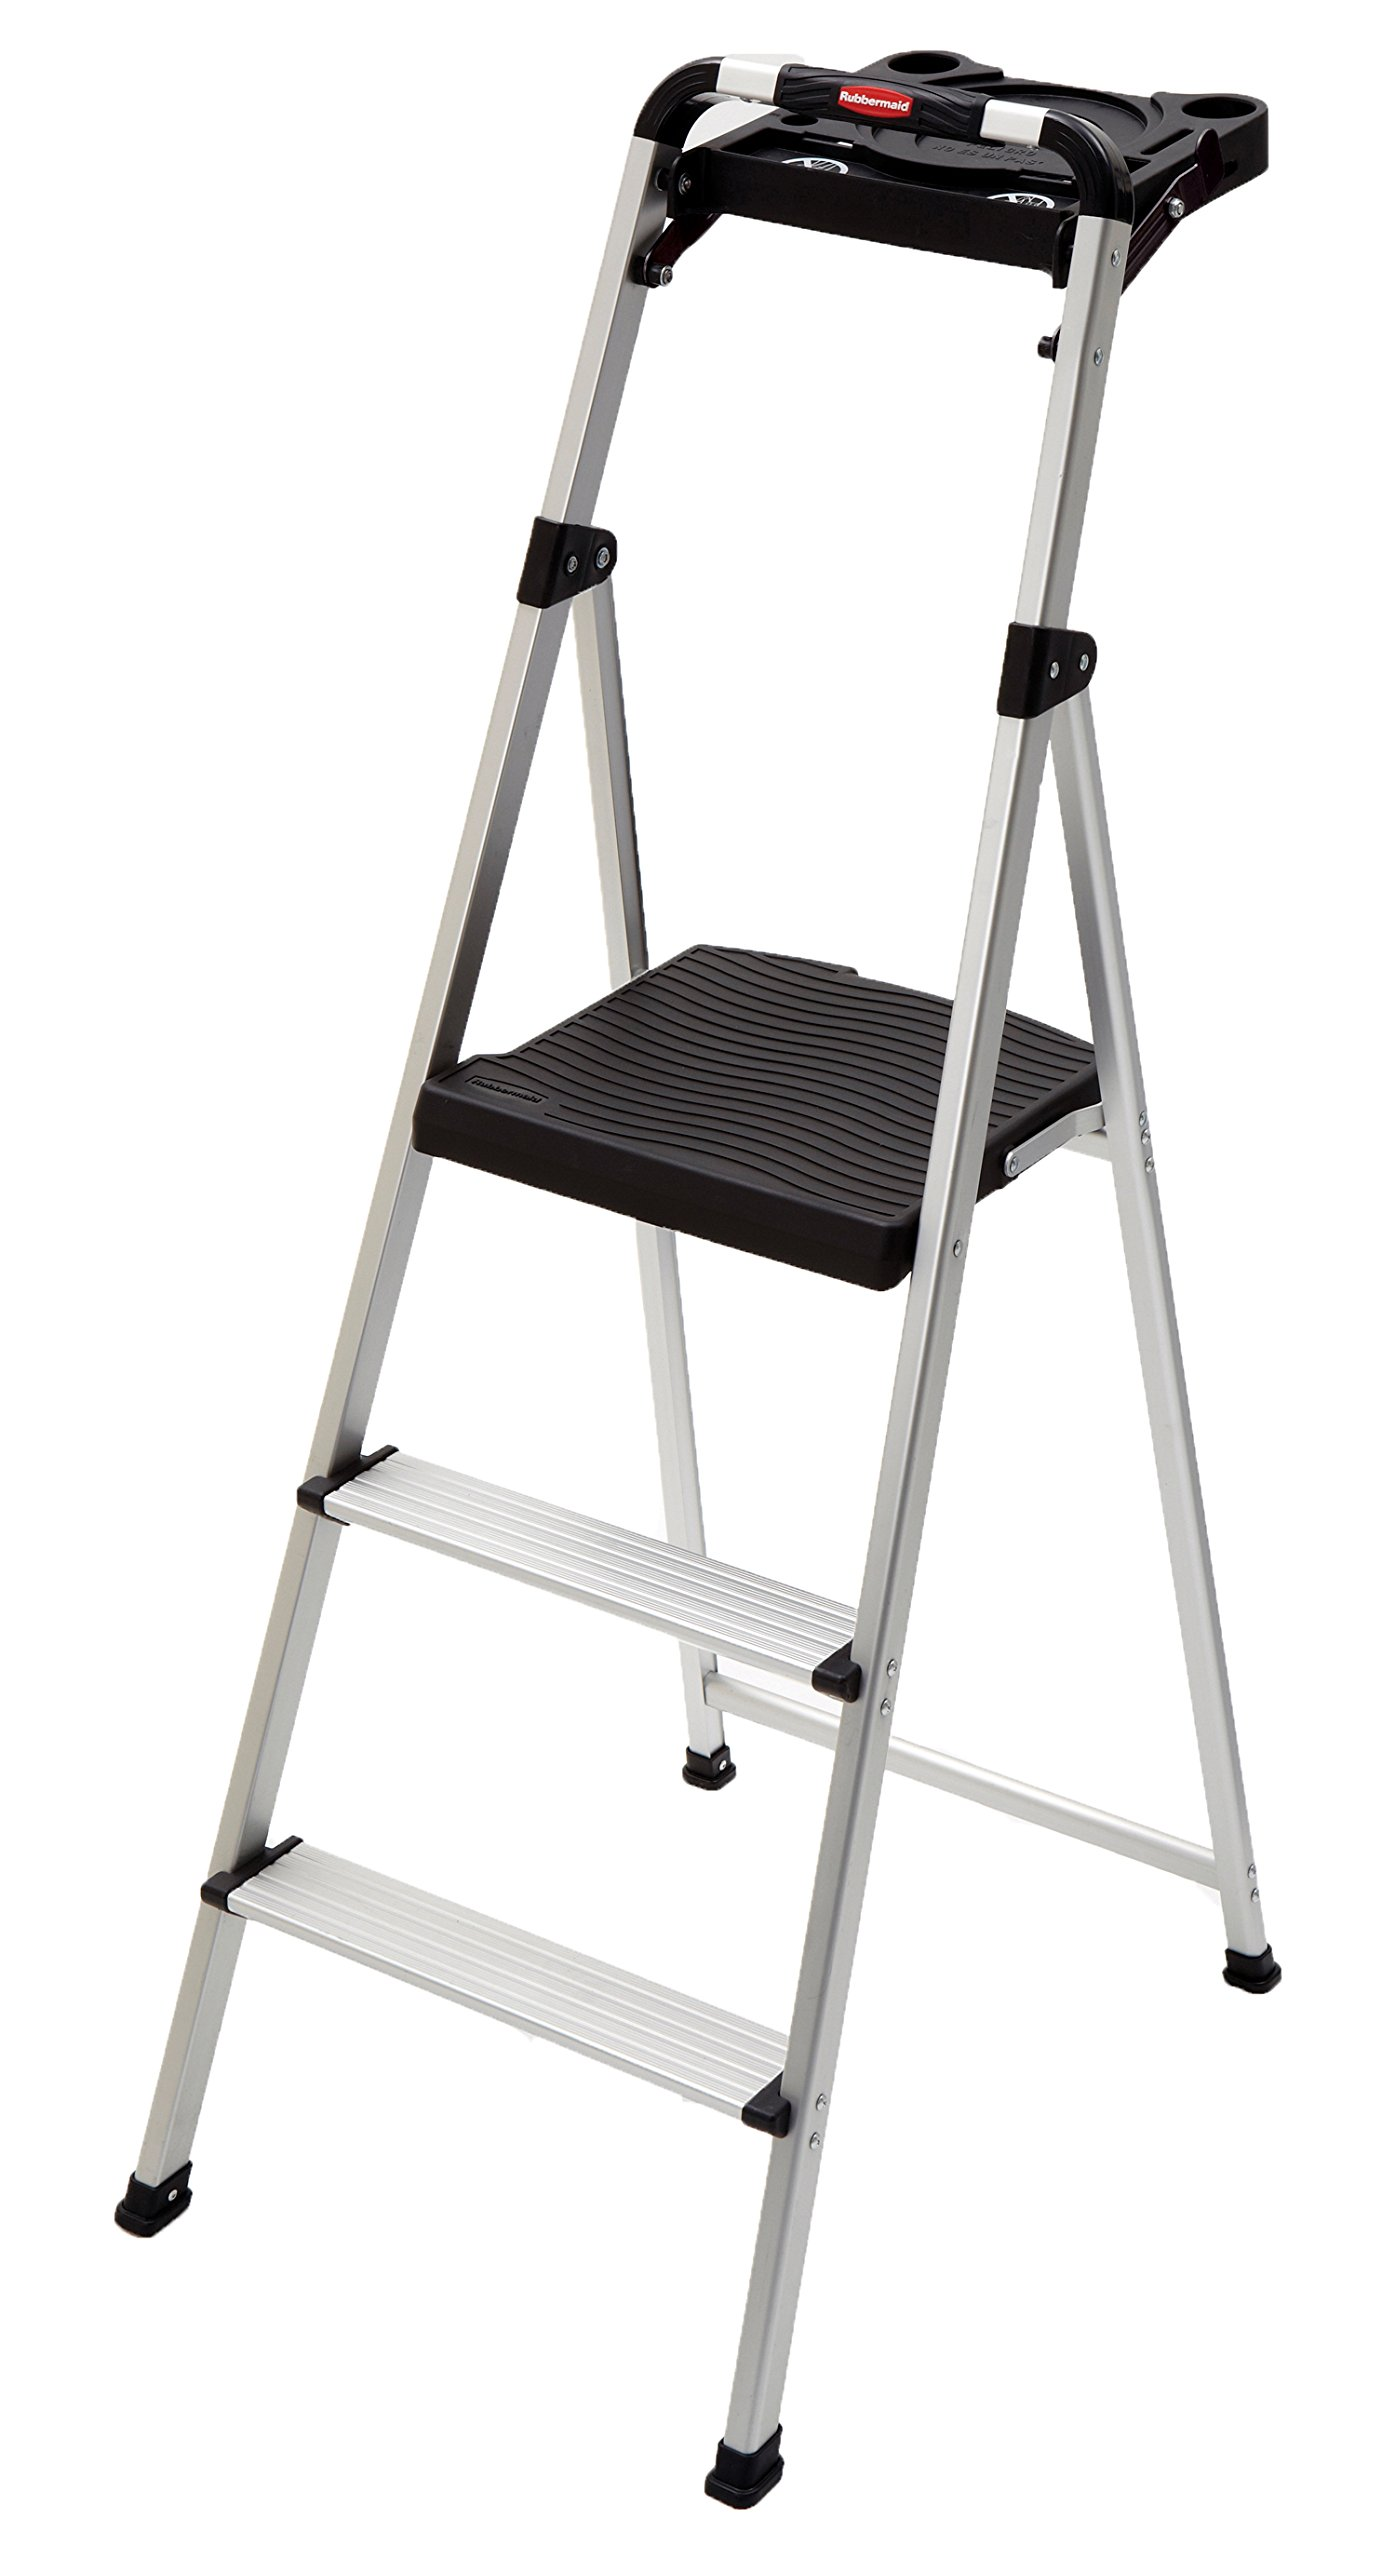 Rubbermaid RM-SLA3-T 3-Step Ultra Light Aluminum Step Stool with Project Tray, 225-Pound Capacity, Grey Finish